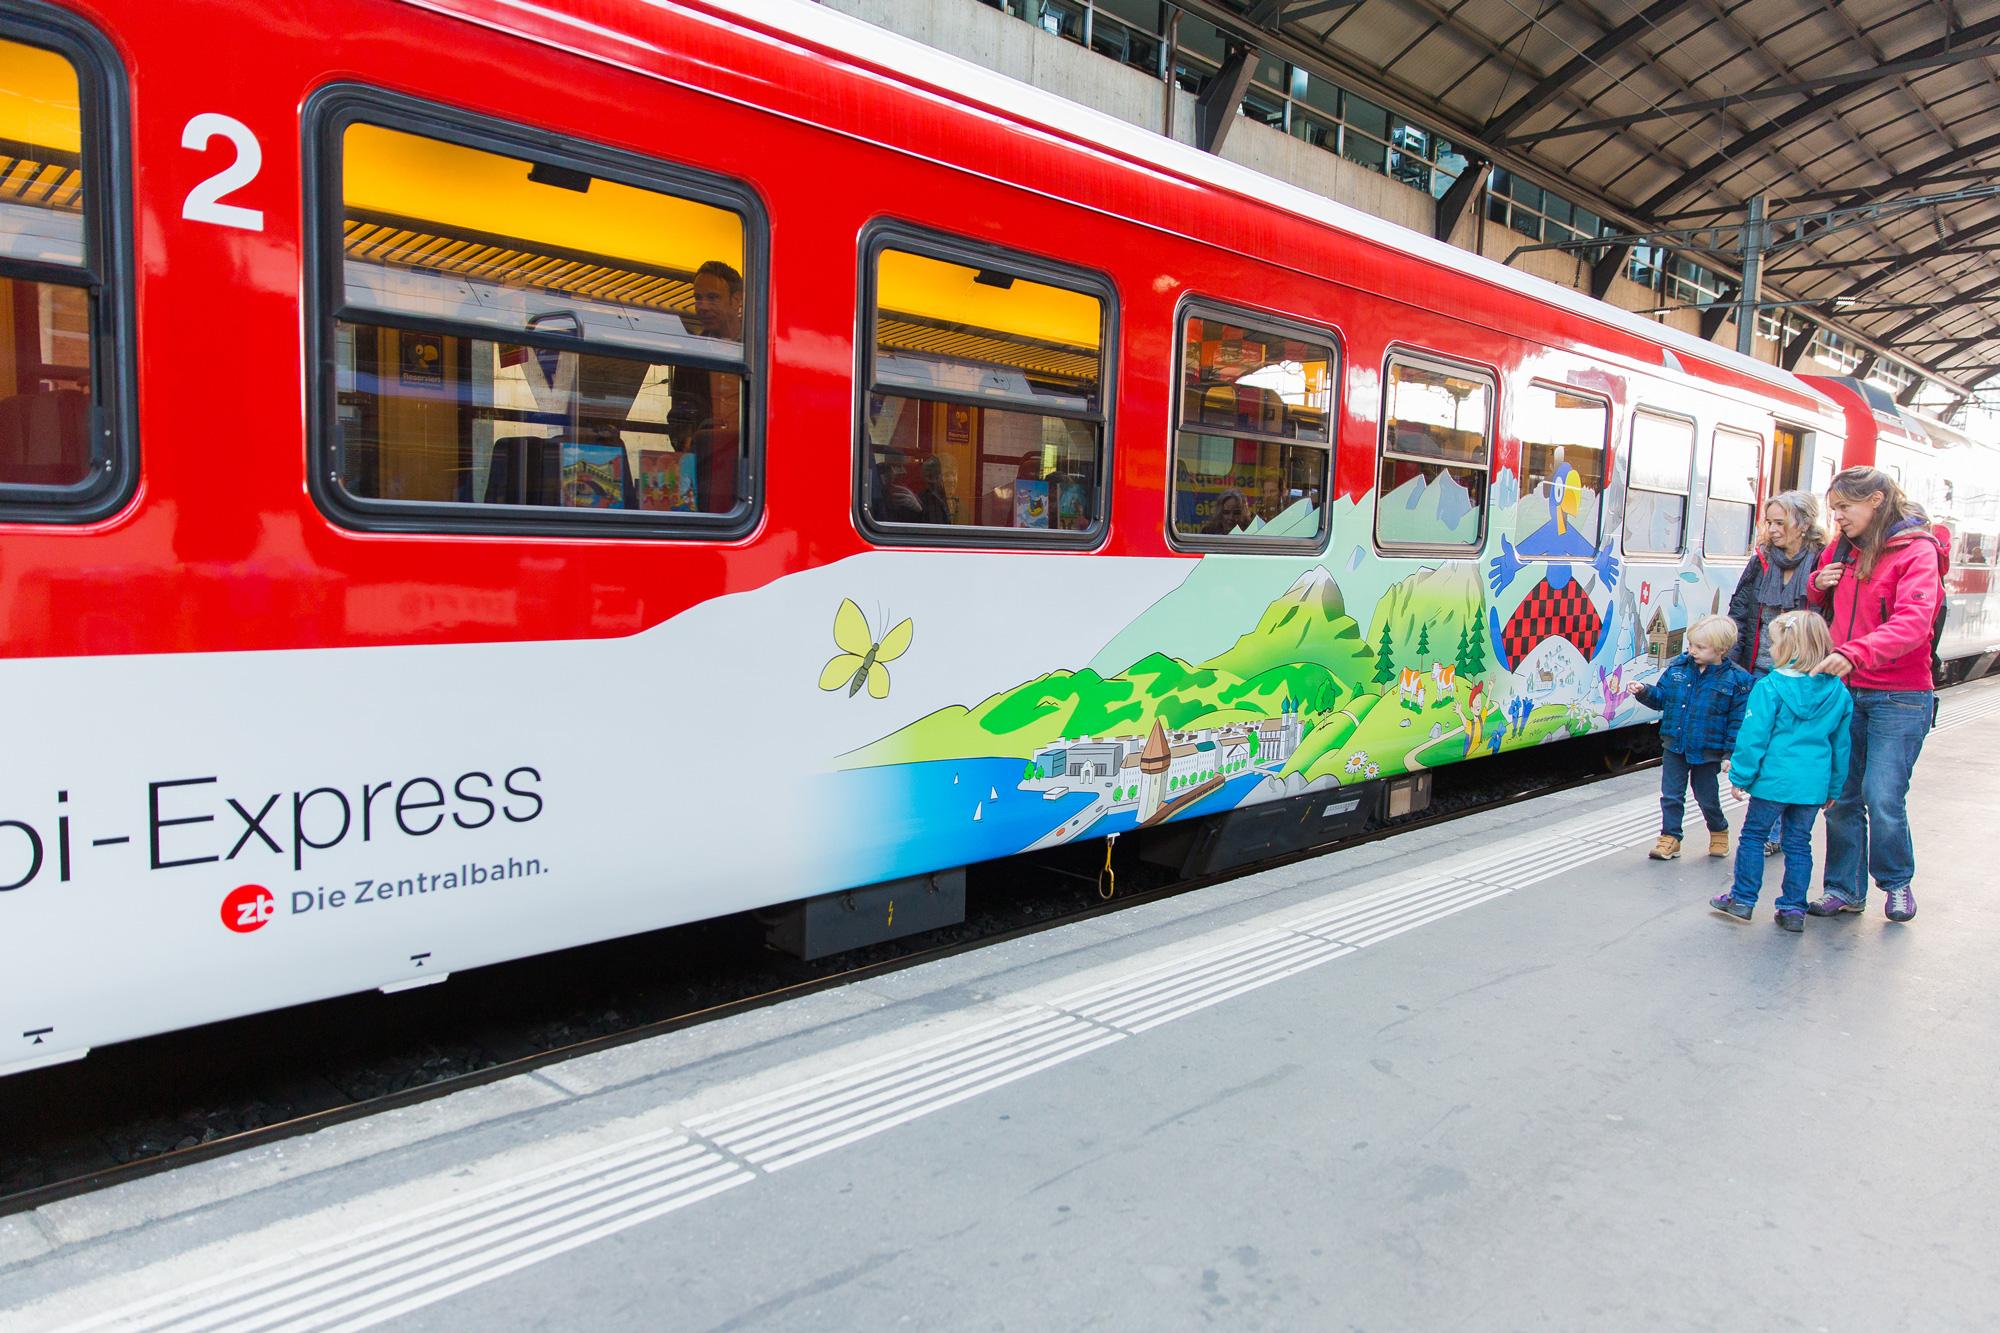 Zentralbahn - Globi-Express